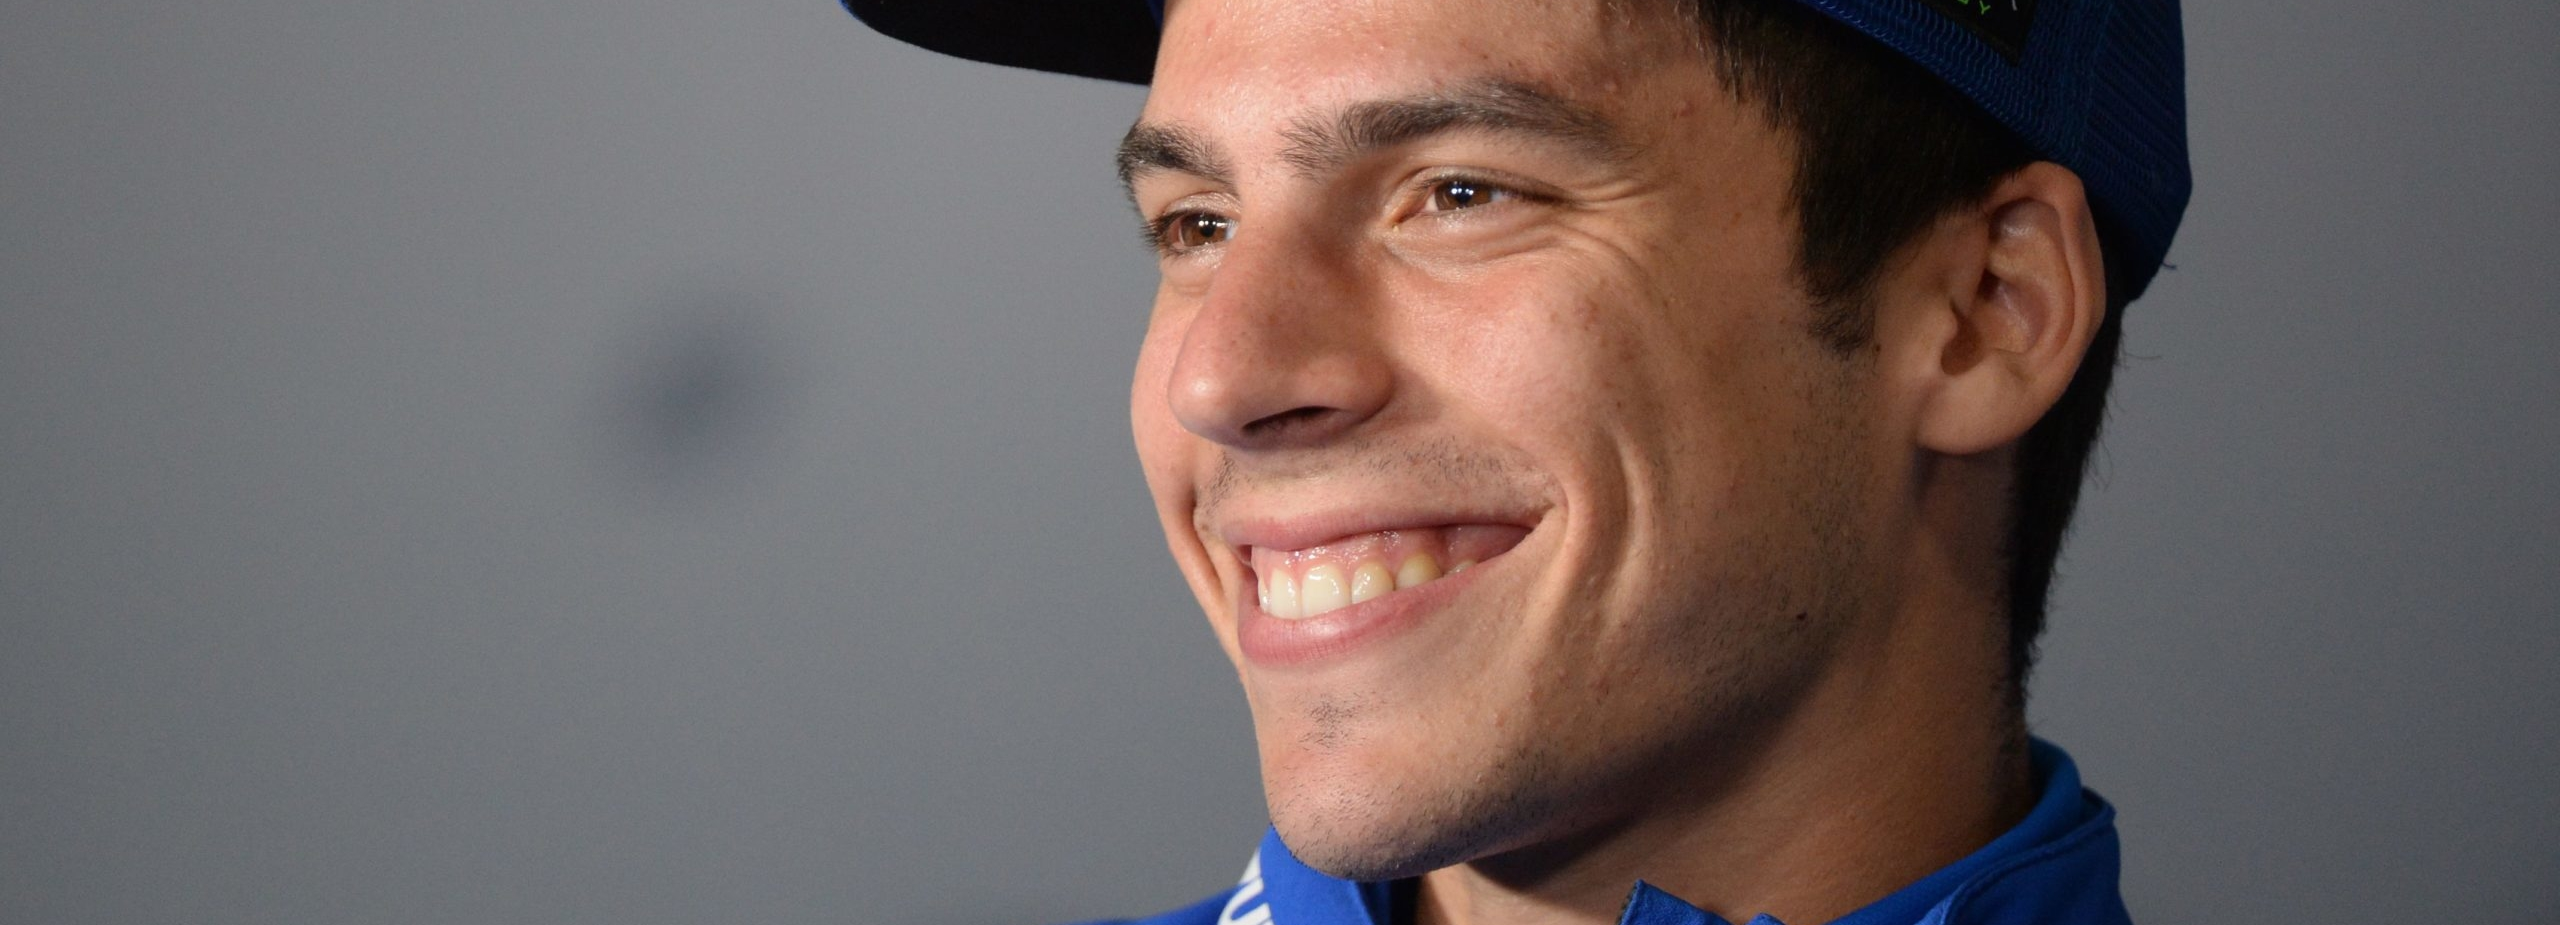 GP Francia: Quartararo, Mir e Bagnaia i favoriti per la vittoria